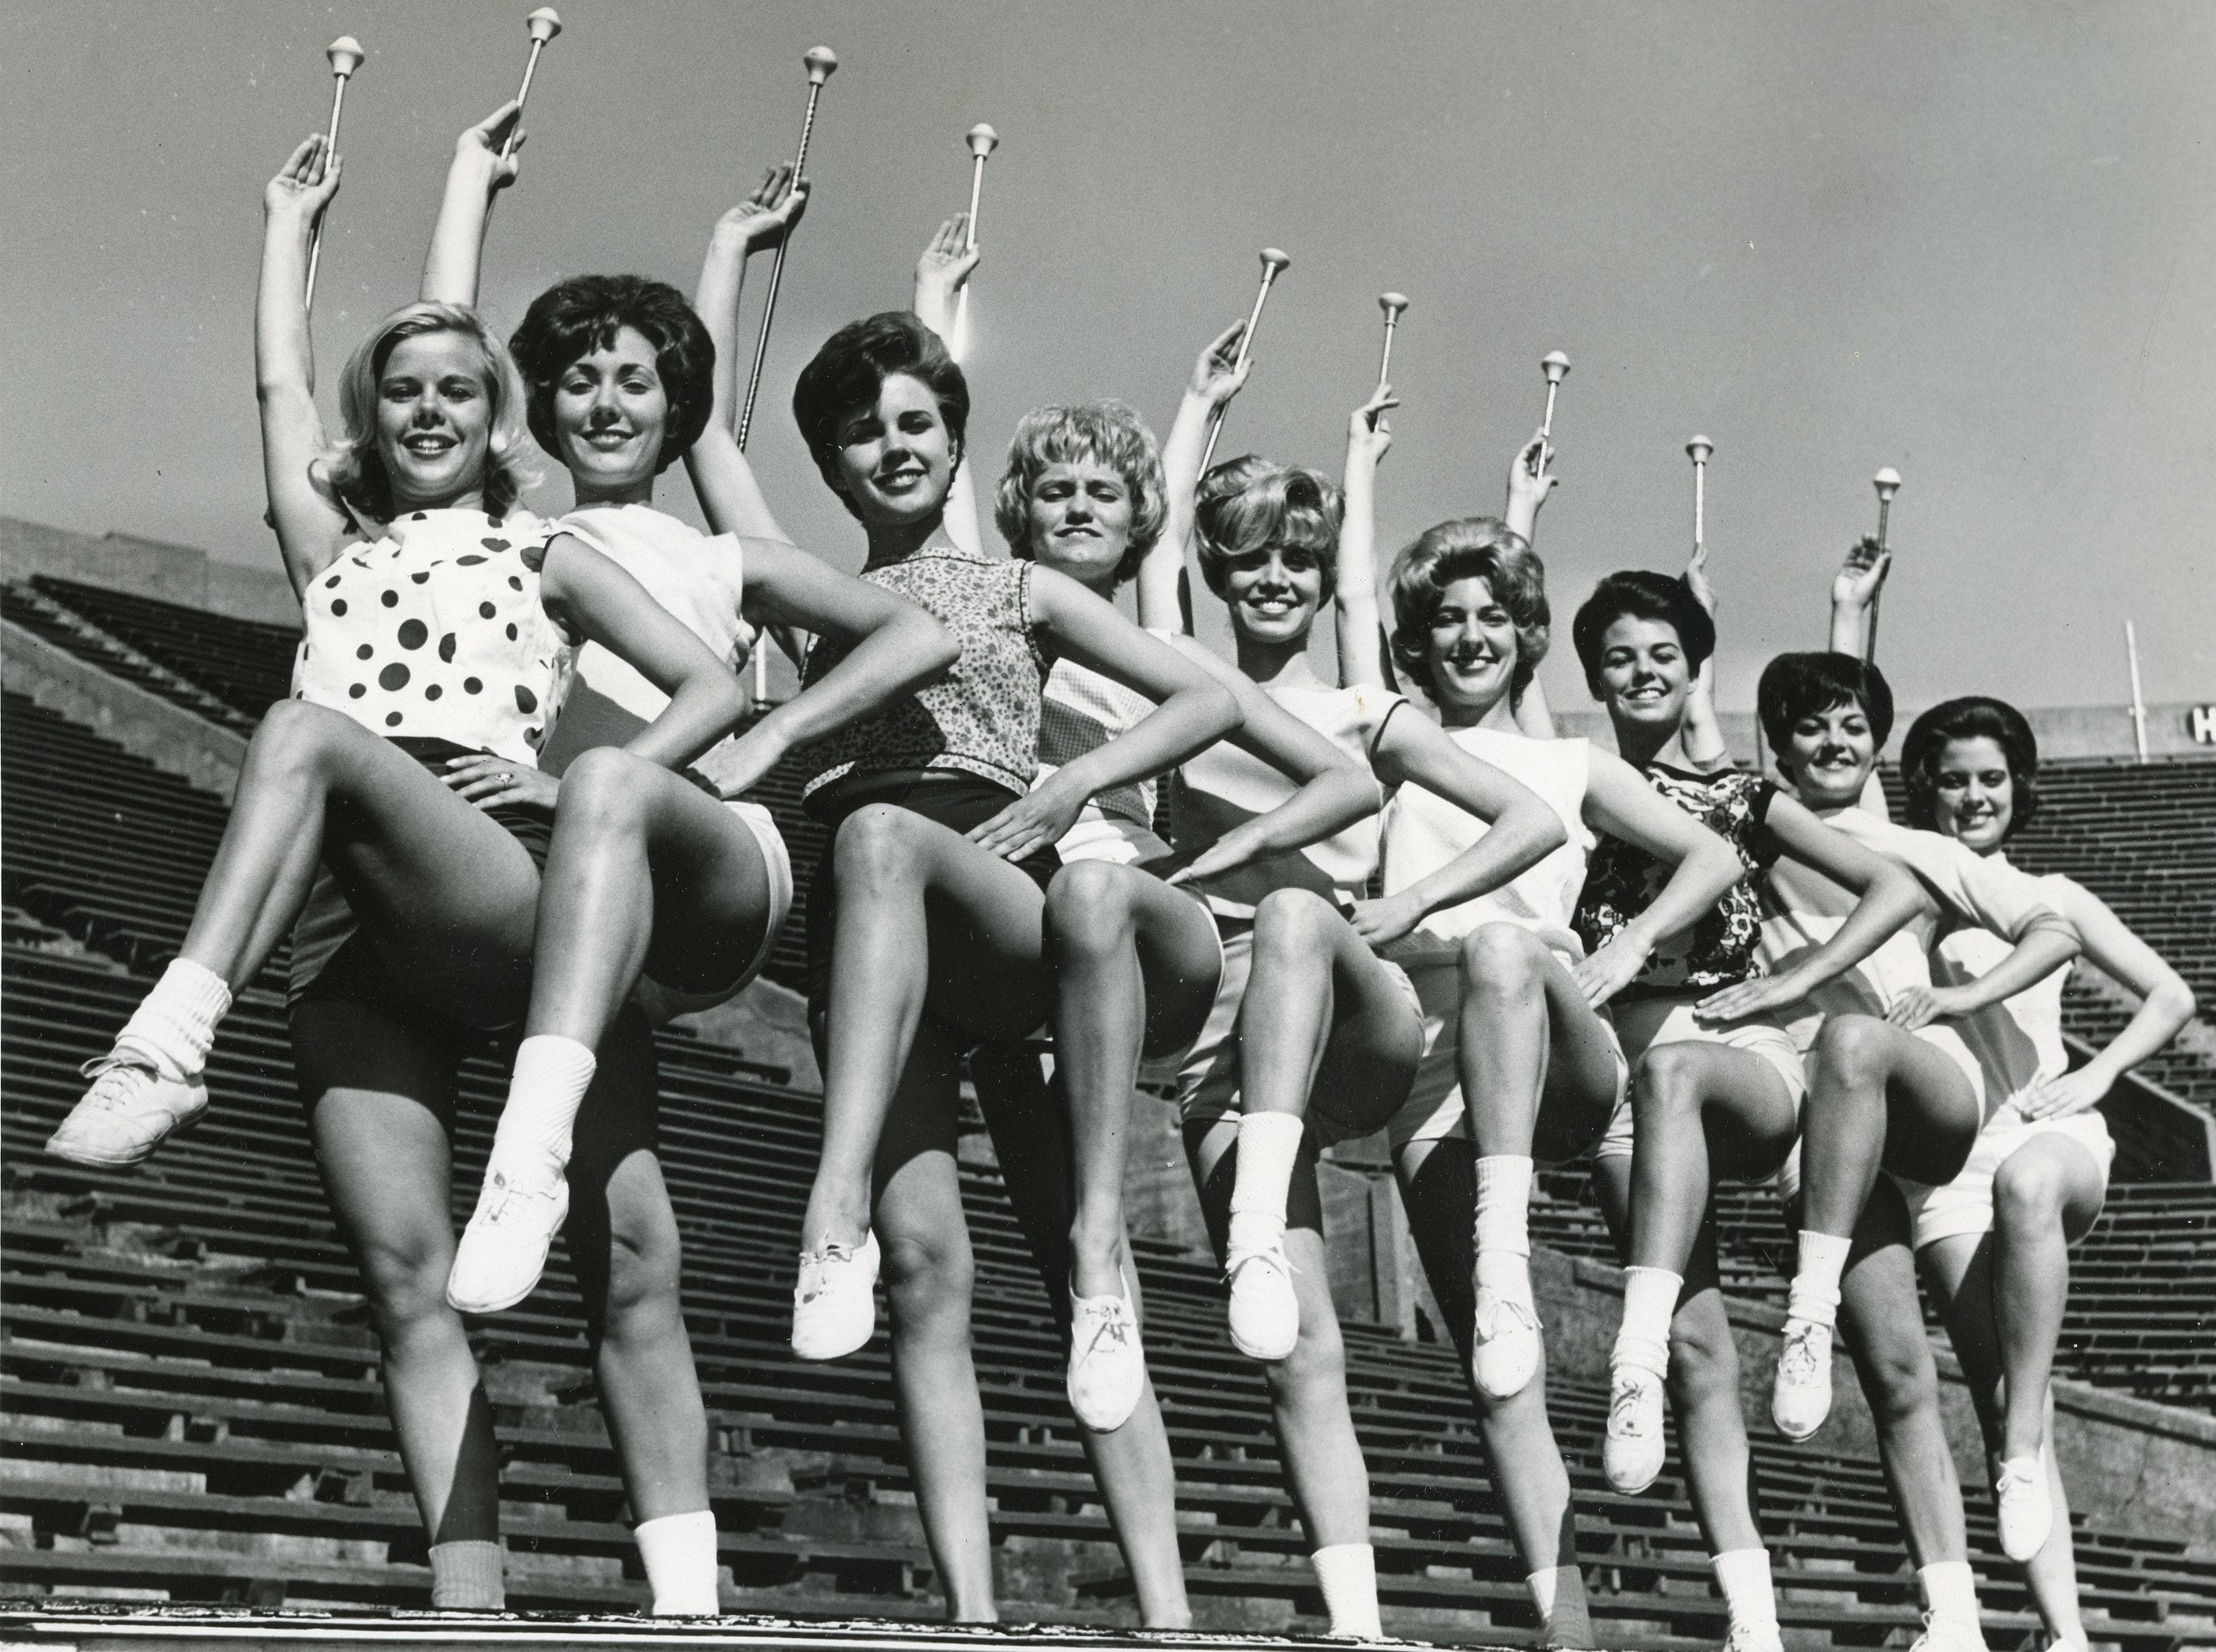 Kicking high for ol' UT were the 1964 majorettes: Mary Nicholon, Valerie Foster, Patti Sue Stuart, Melinda Hewgley, Judy Barton, Brenda Flowers, Bette Carlson, Betty Sue Little and Judy Phillips.